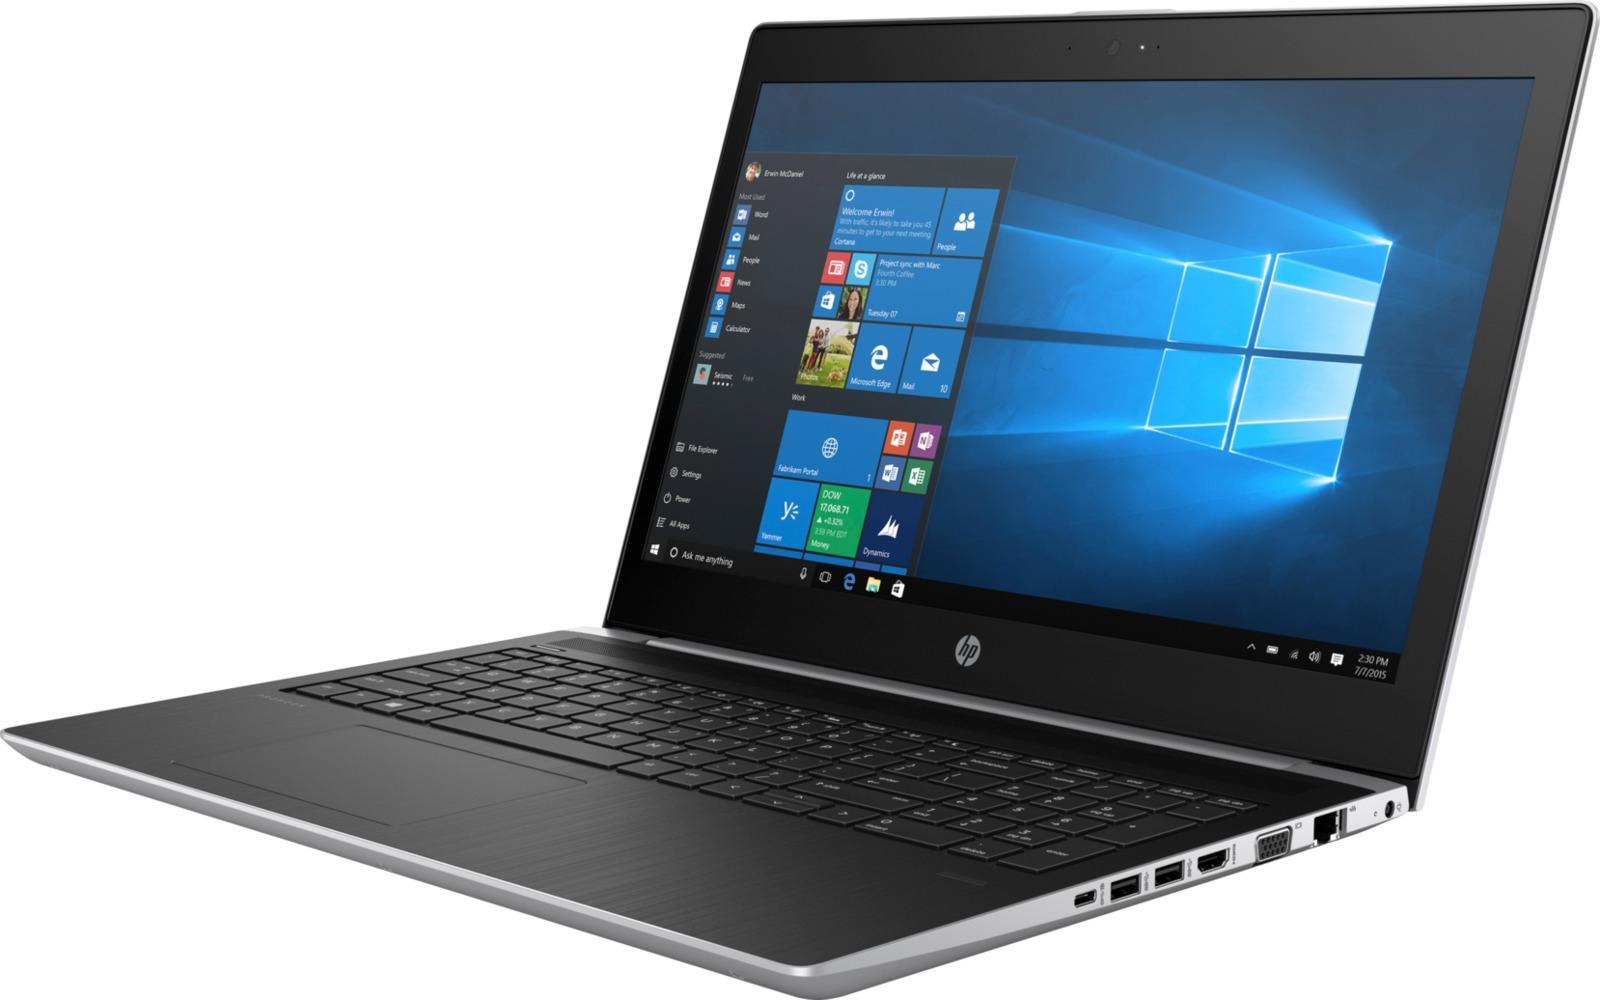 15.6 Ноутбук HP ProBook 450 G5 4WV28EA, серебристый new us laptop keyboard for hp probook 450 g5 455 g5 470 g5 english black keyboard